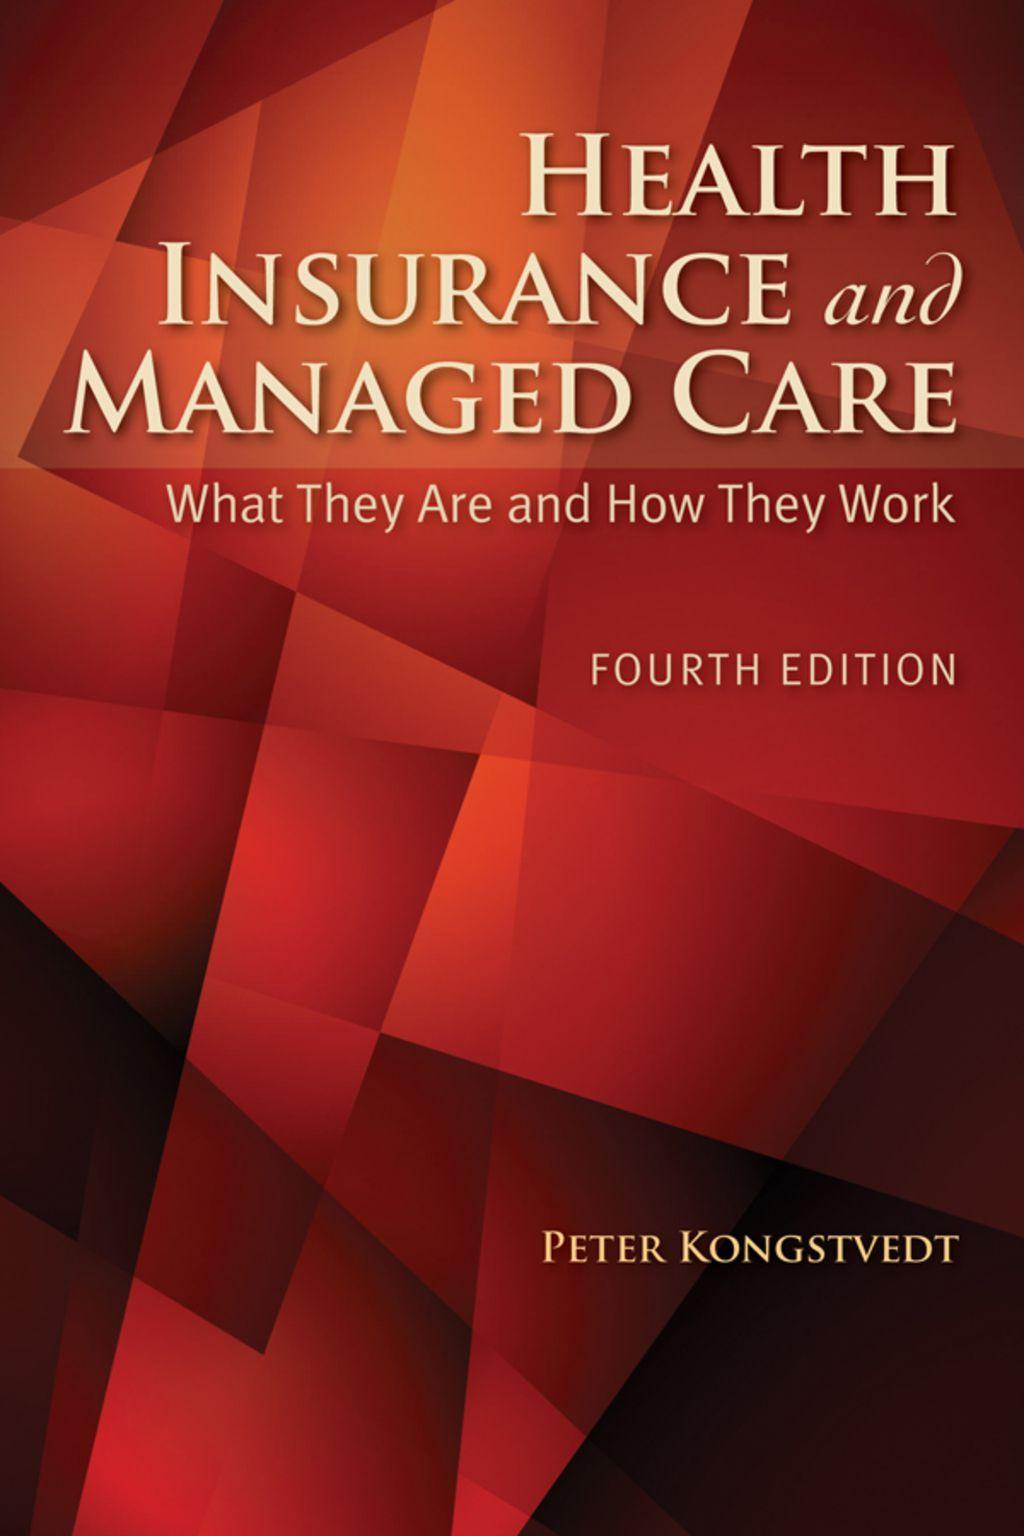 Health Insurance And Managed Care Ebook Rental Cigna Health